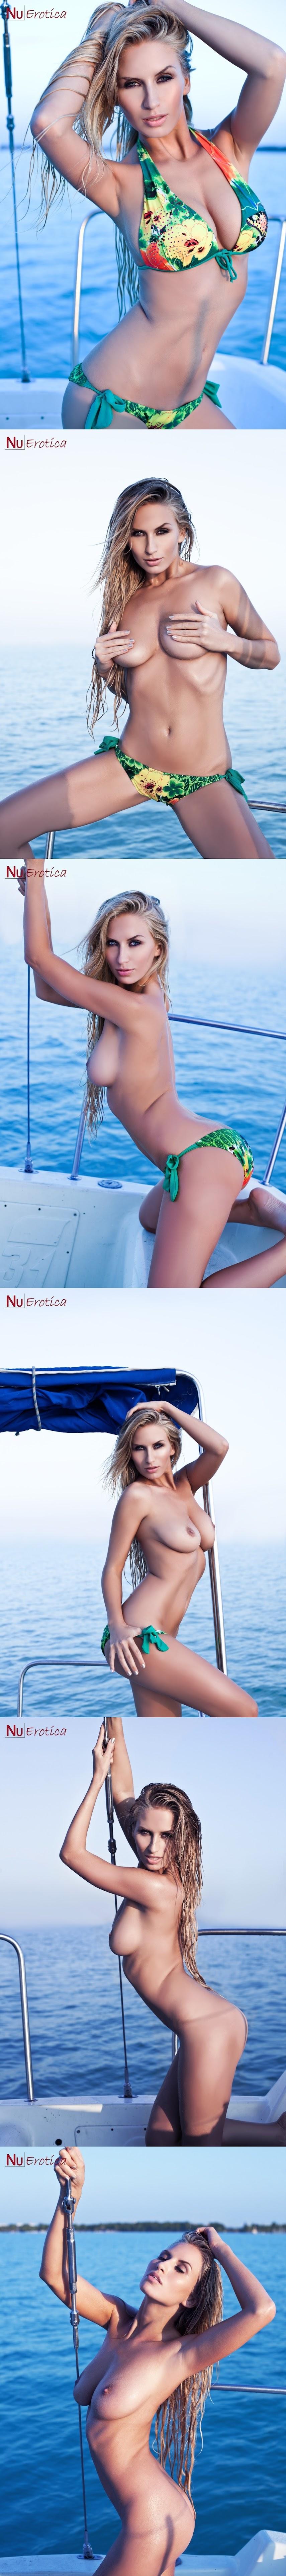 2015-03-15_Evelin_Aubert_-_Evelin_On_The_Boat.zip-jk- NuErotica 2015-03-15 Evelin Aubert - Evelin On The Boat